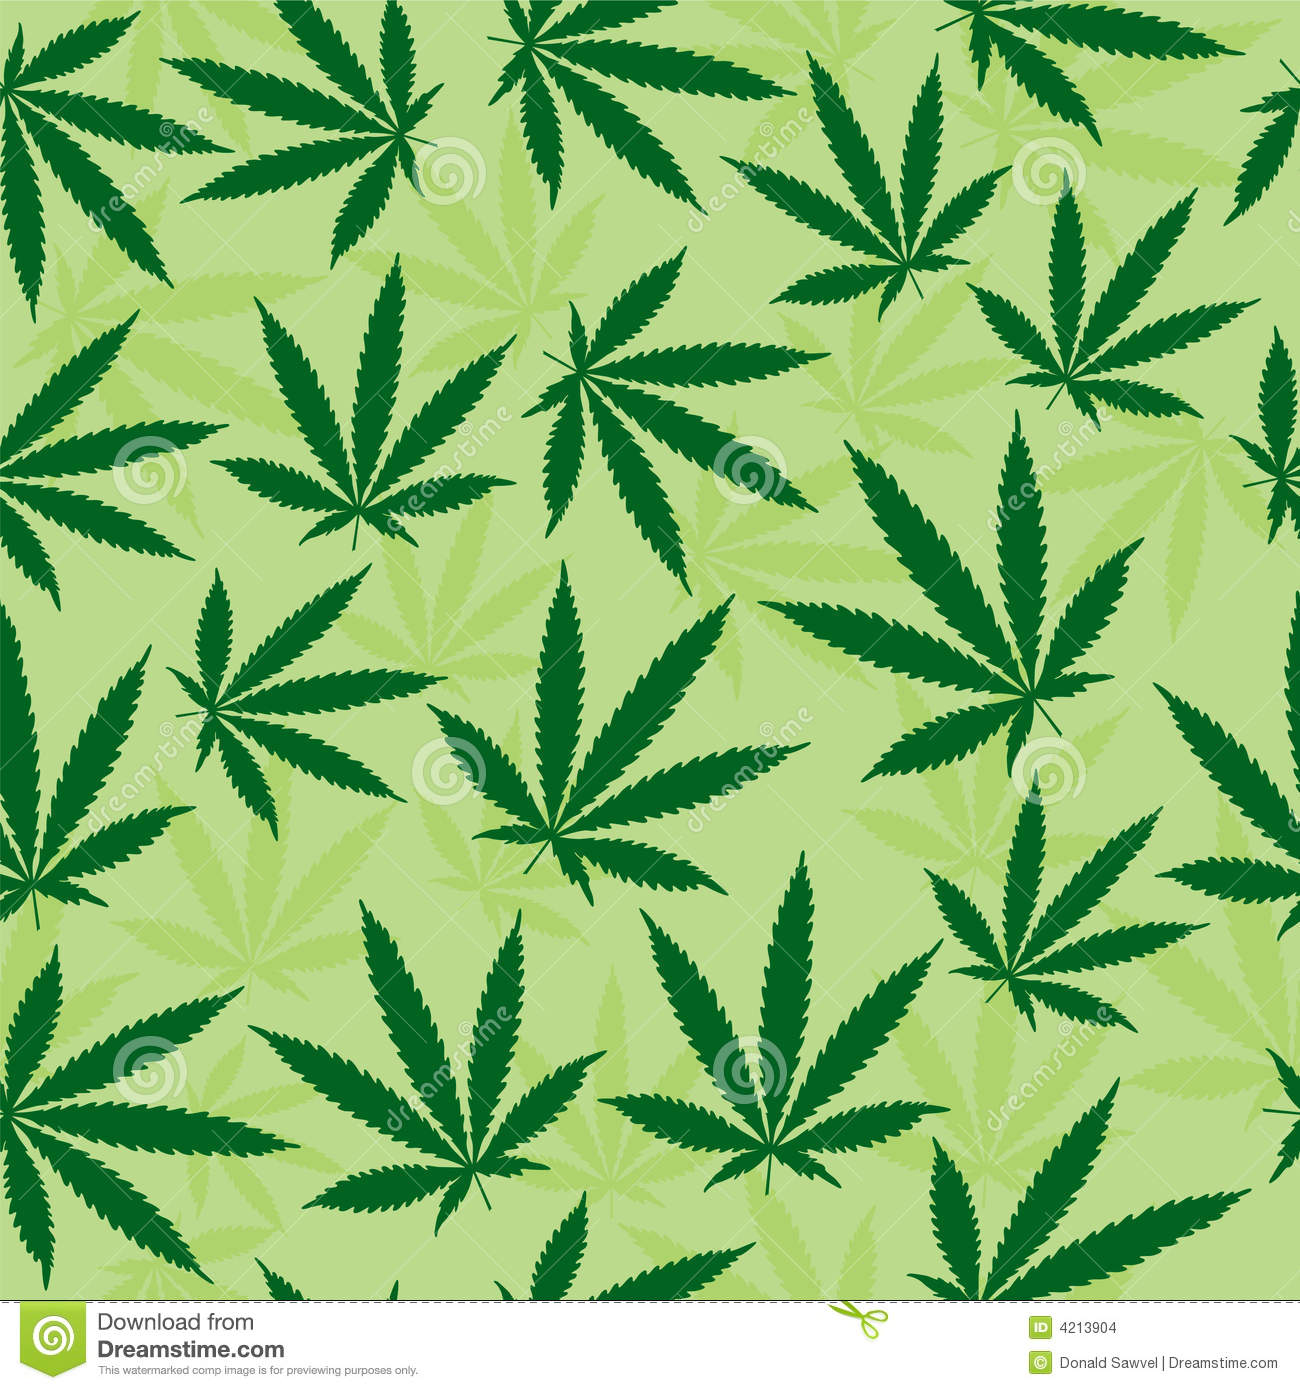 marijuana leaf wallpaper wallpapersafari marijuana leaf black background marijuana leaf background pattern